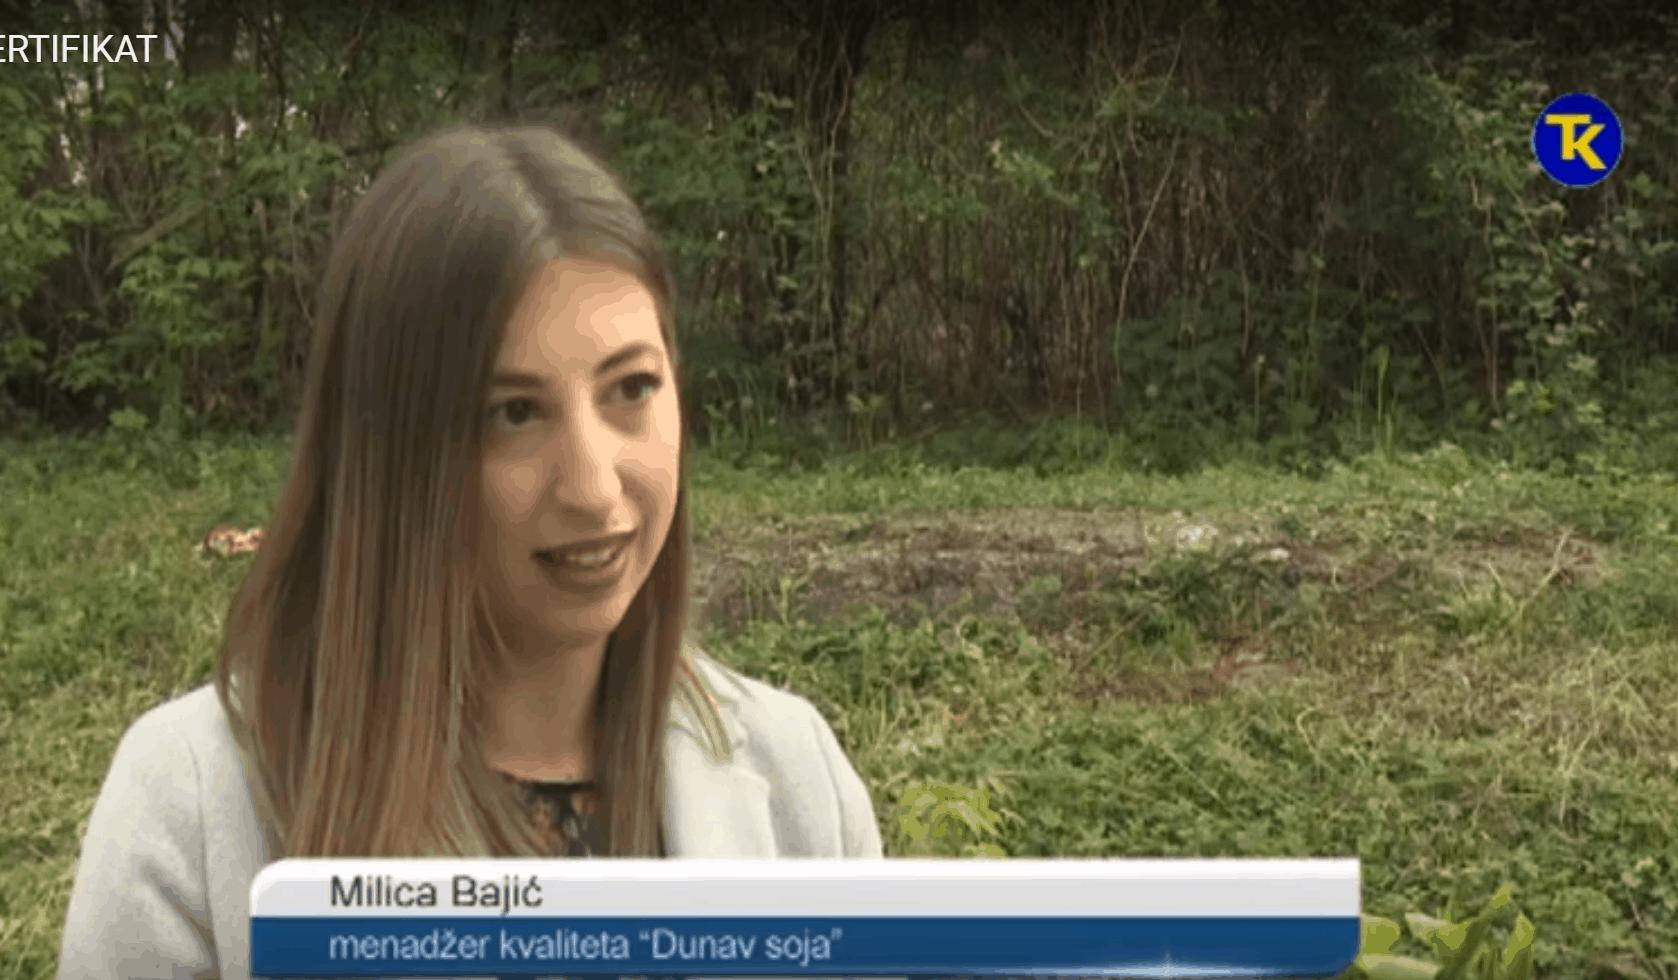 RTVTK, BEZ GMO SERTIFIKAT, 02.05.2019